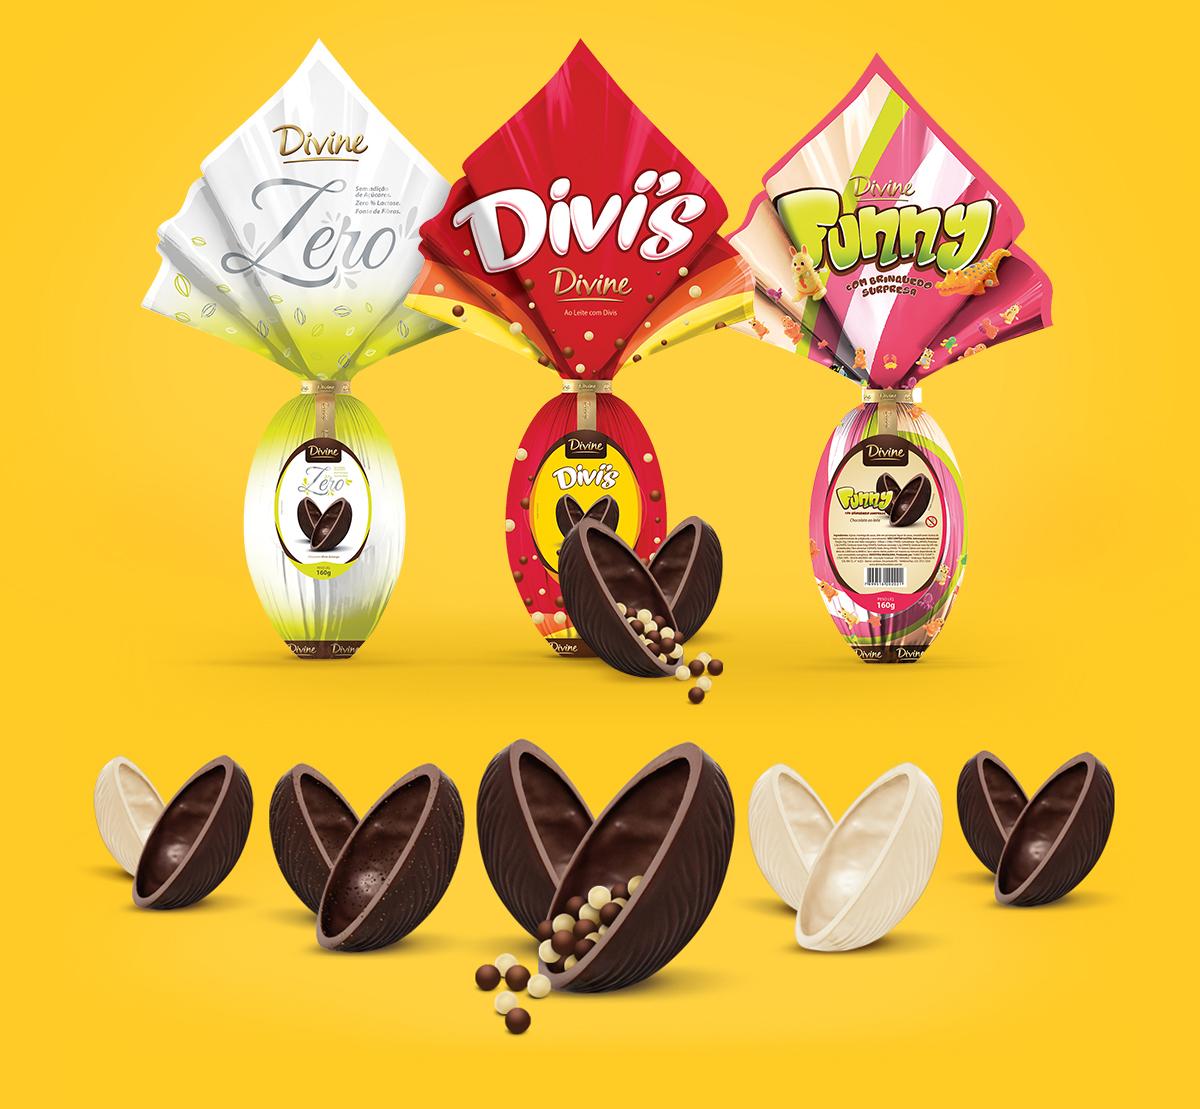 Agncia---Toyz---Propaganda---Publicidade---Divine---Chocolates---Redesign_1200